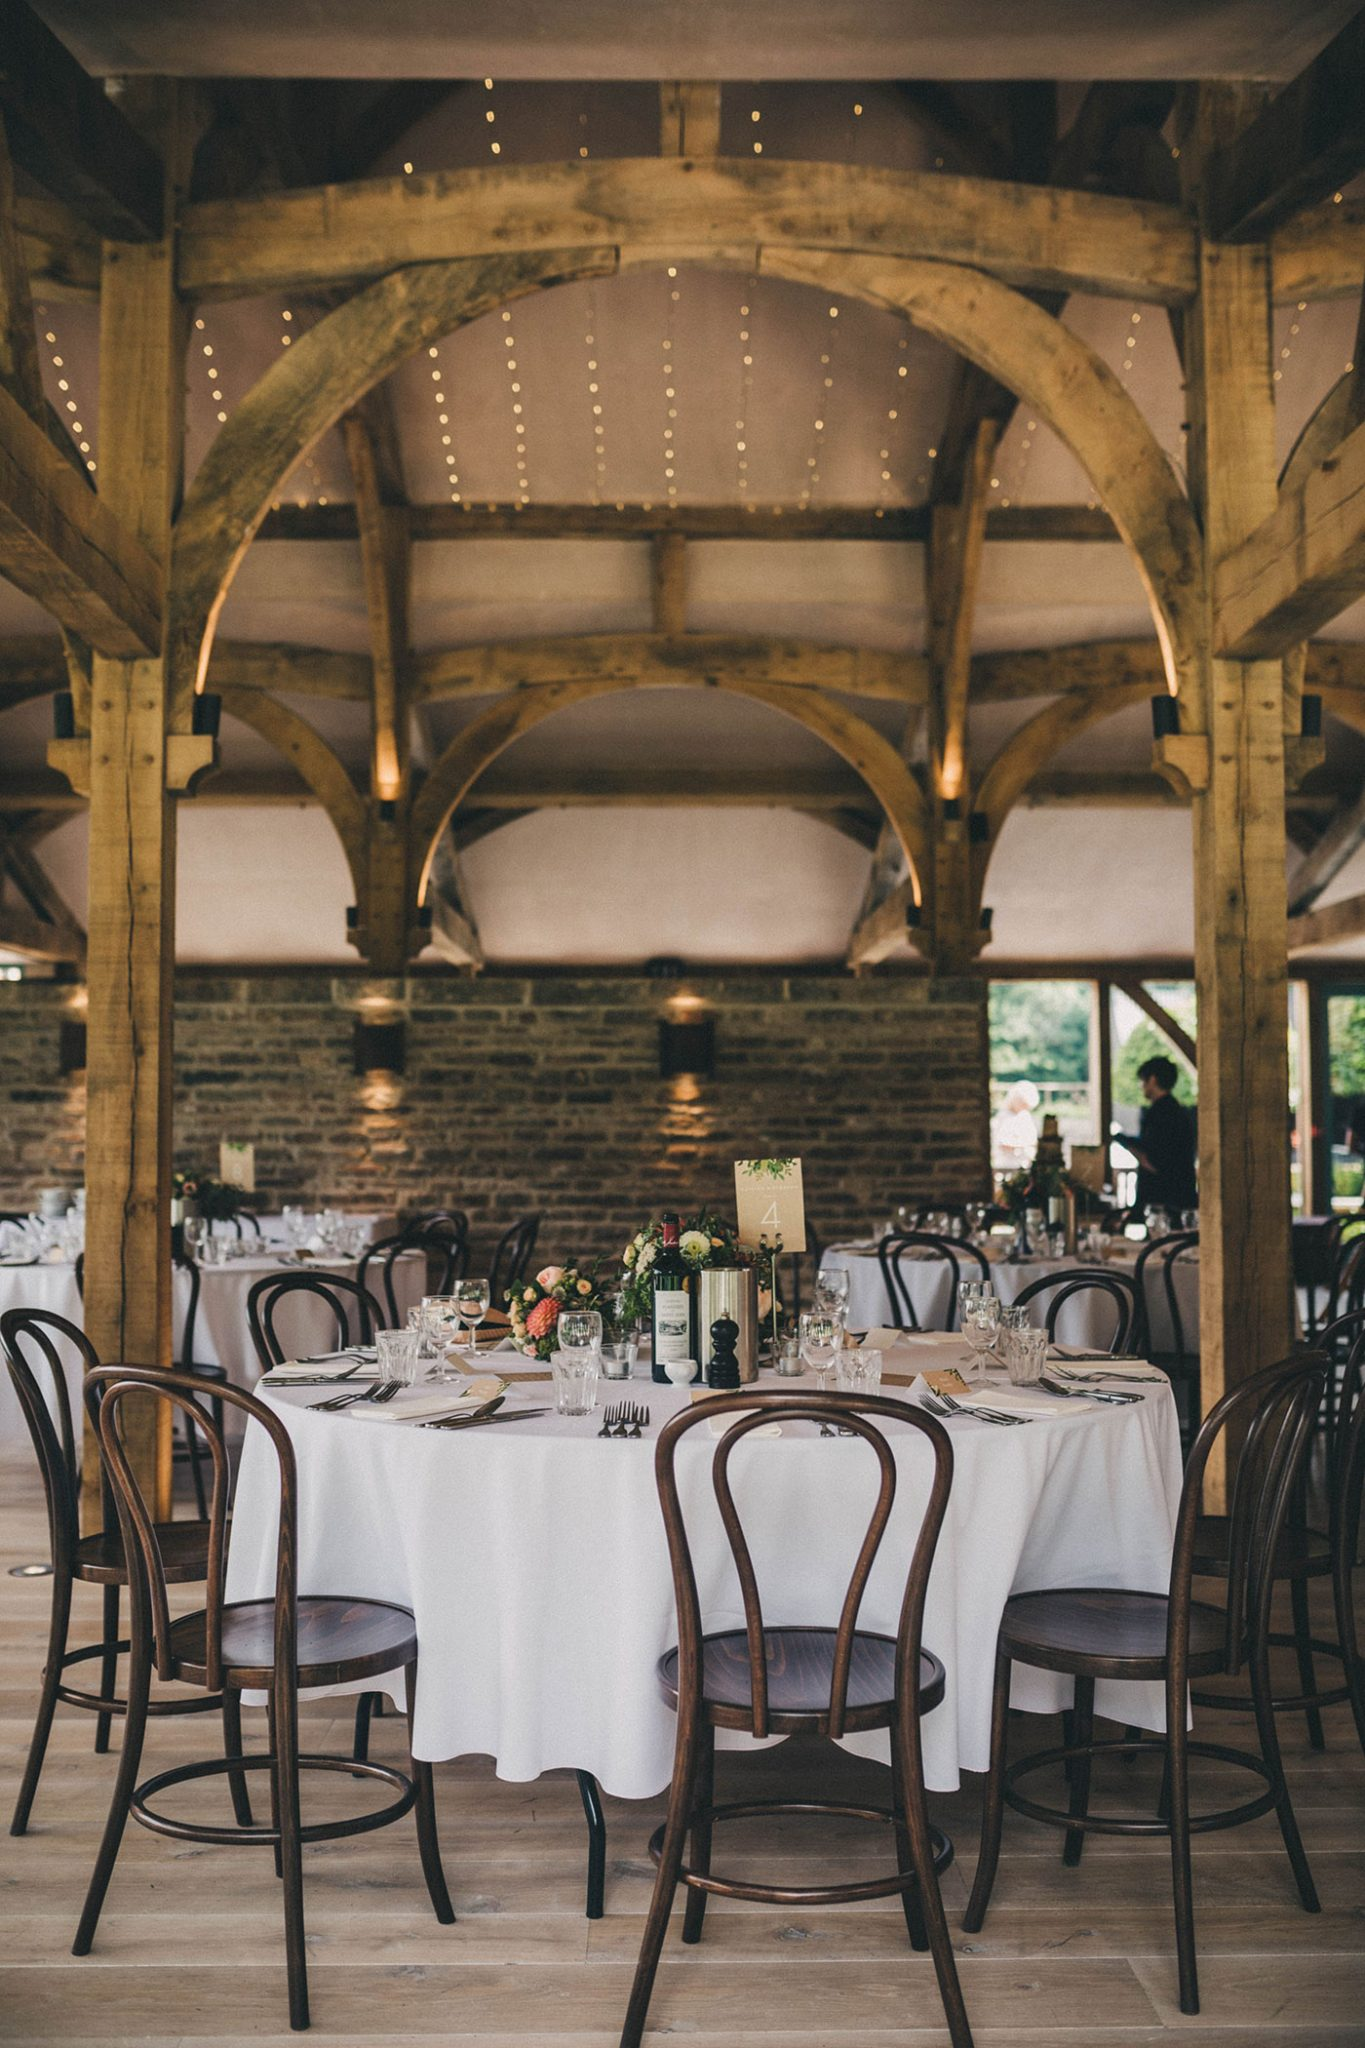 Hazel Gap Barn Wedding Venue